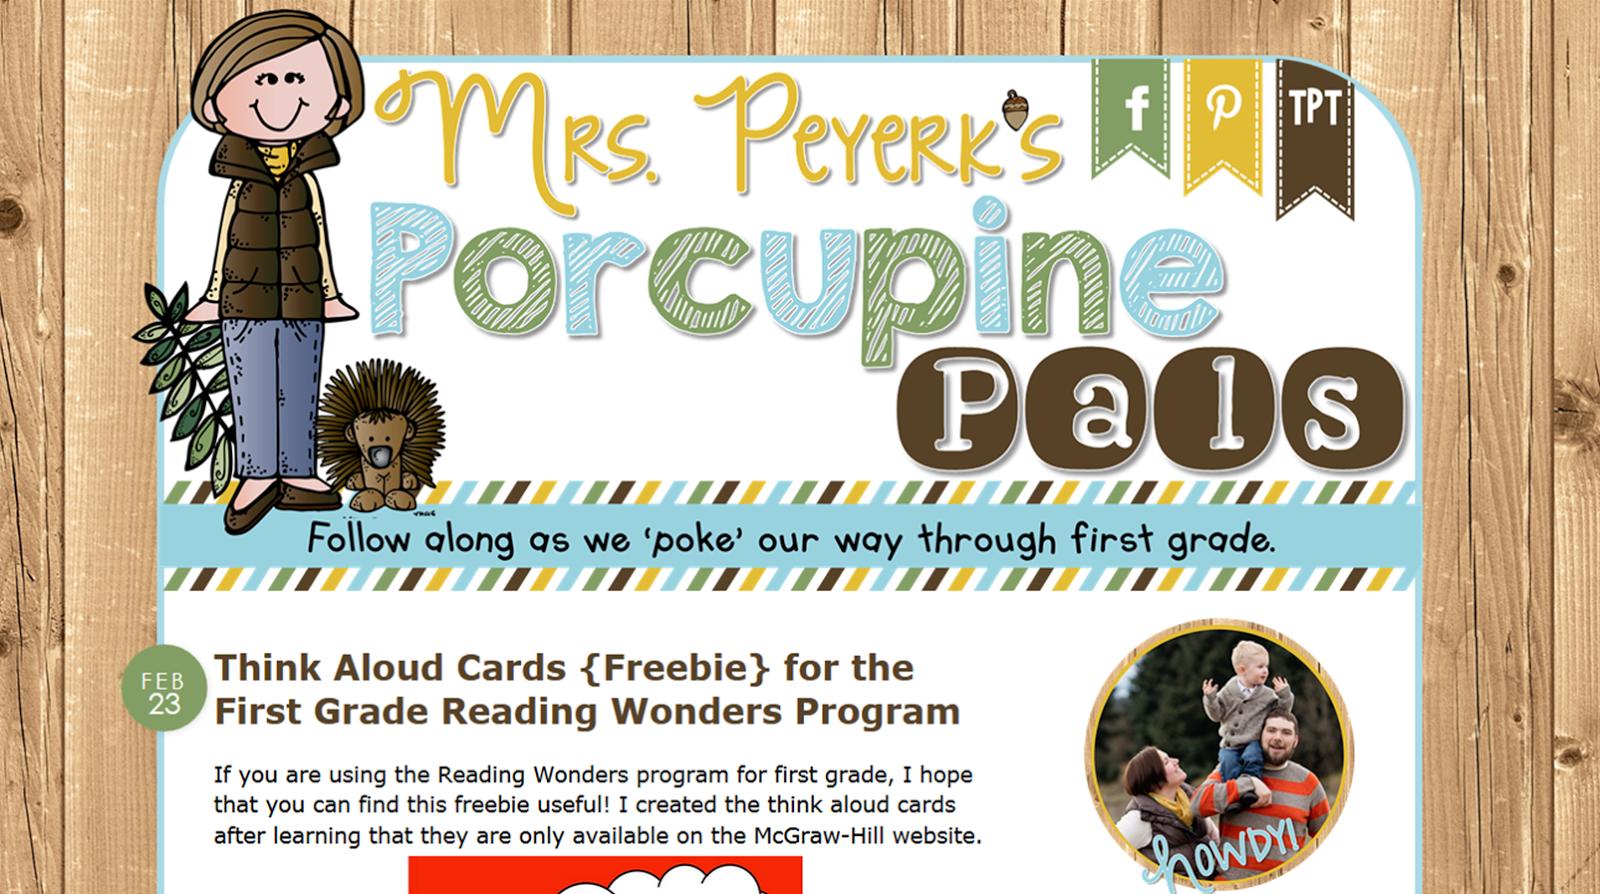 http://www.porcupinepals.blogspot.com/